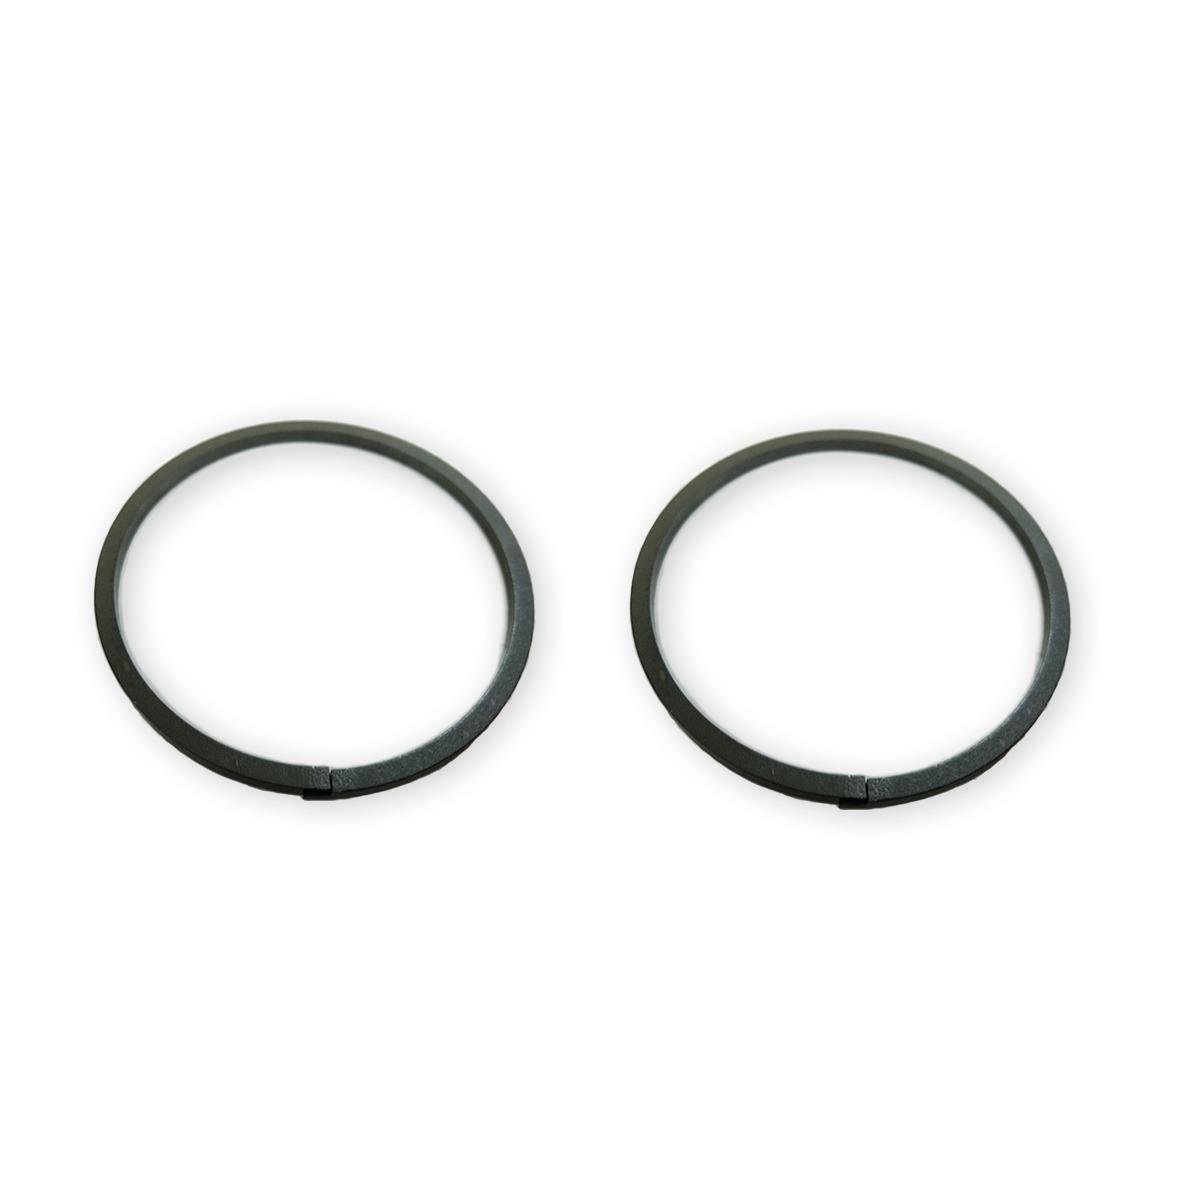 2 Anéis do Diferencial Cambio Automático 4t40 4t45